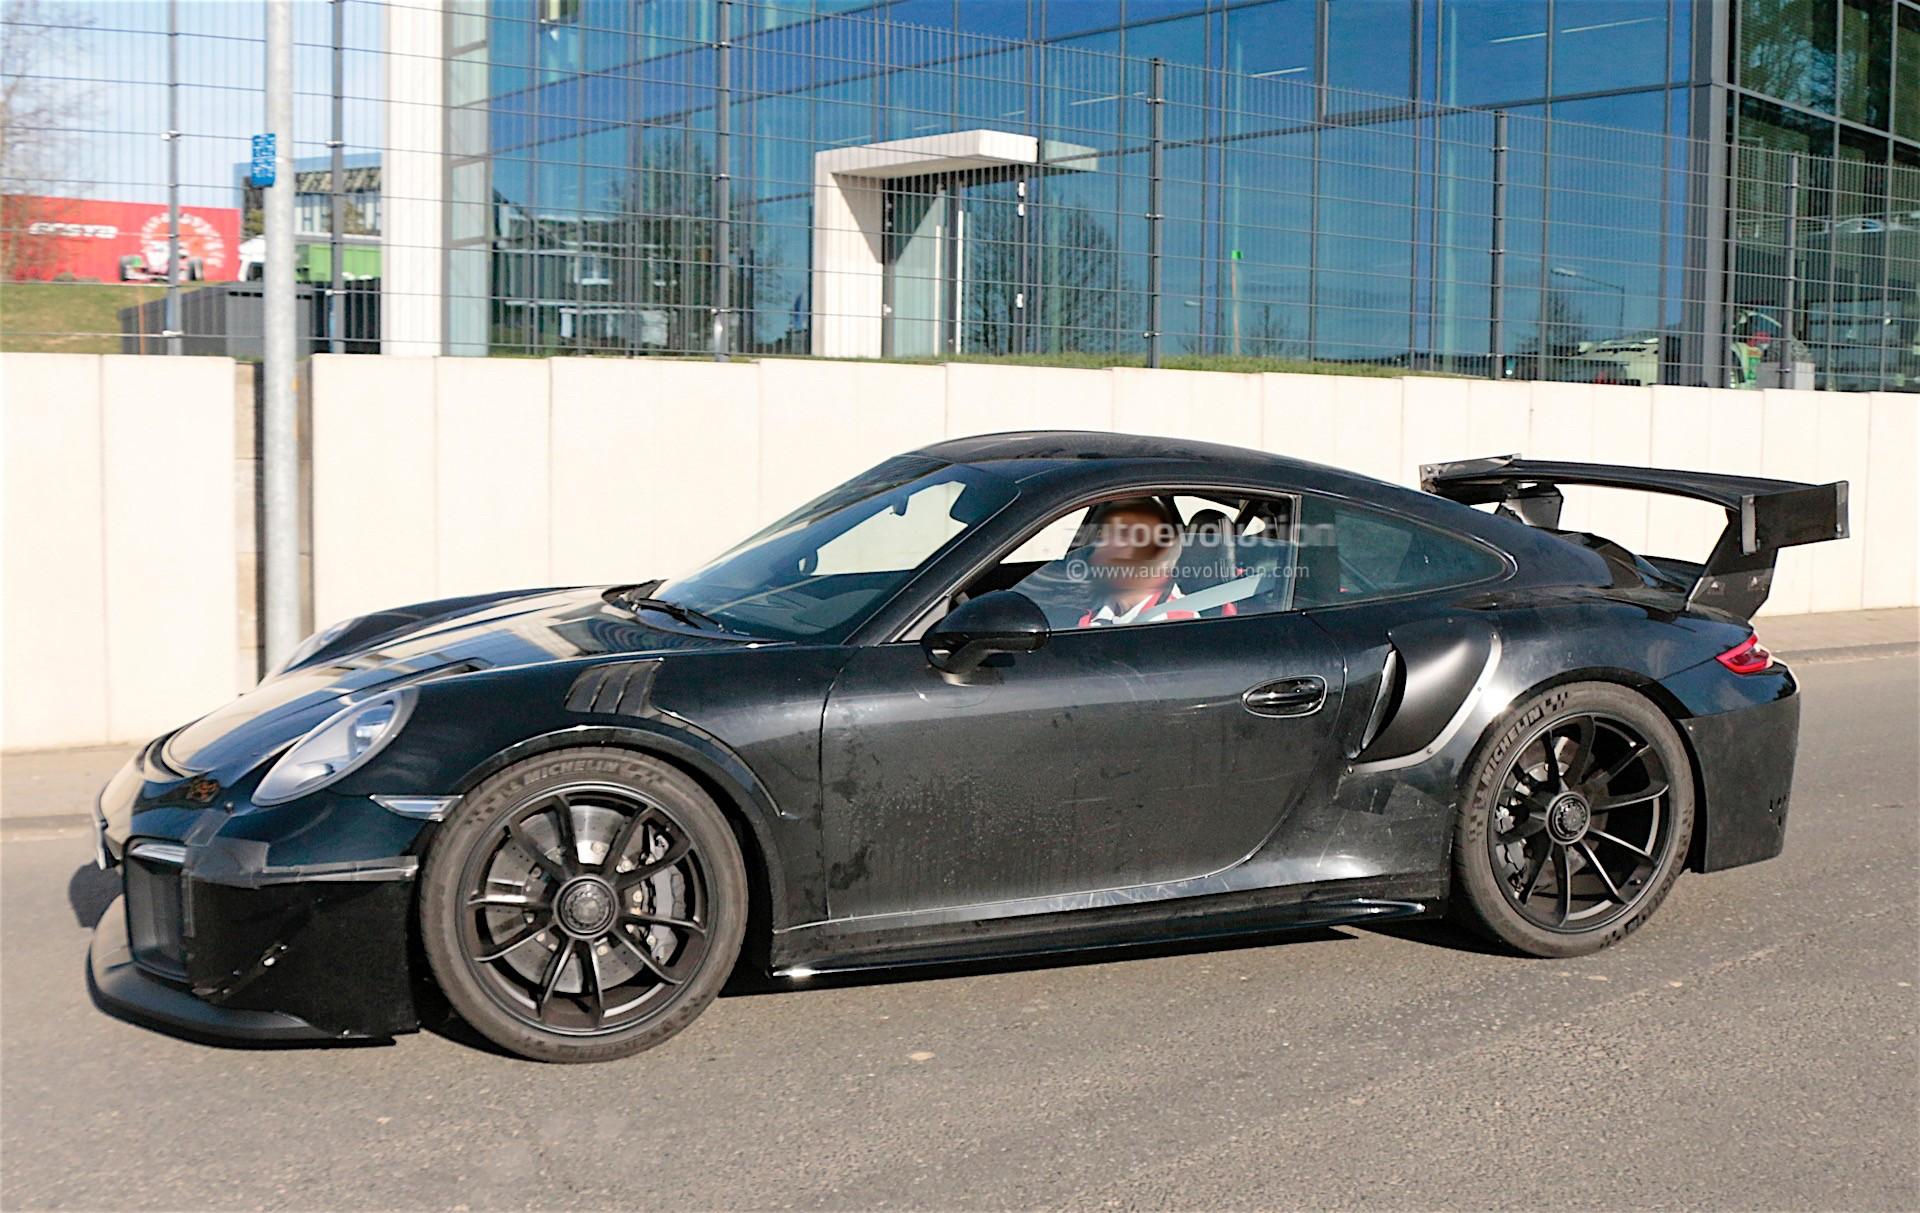 Porsche 911 Safari Is The Offroad Sportscar Zuffenhausen